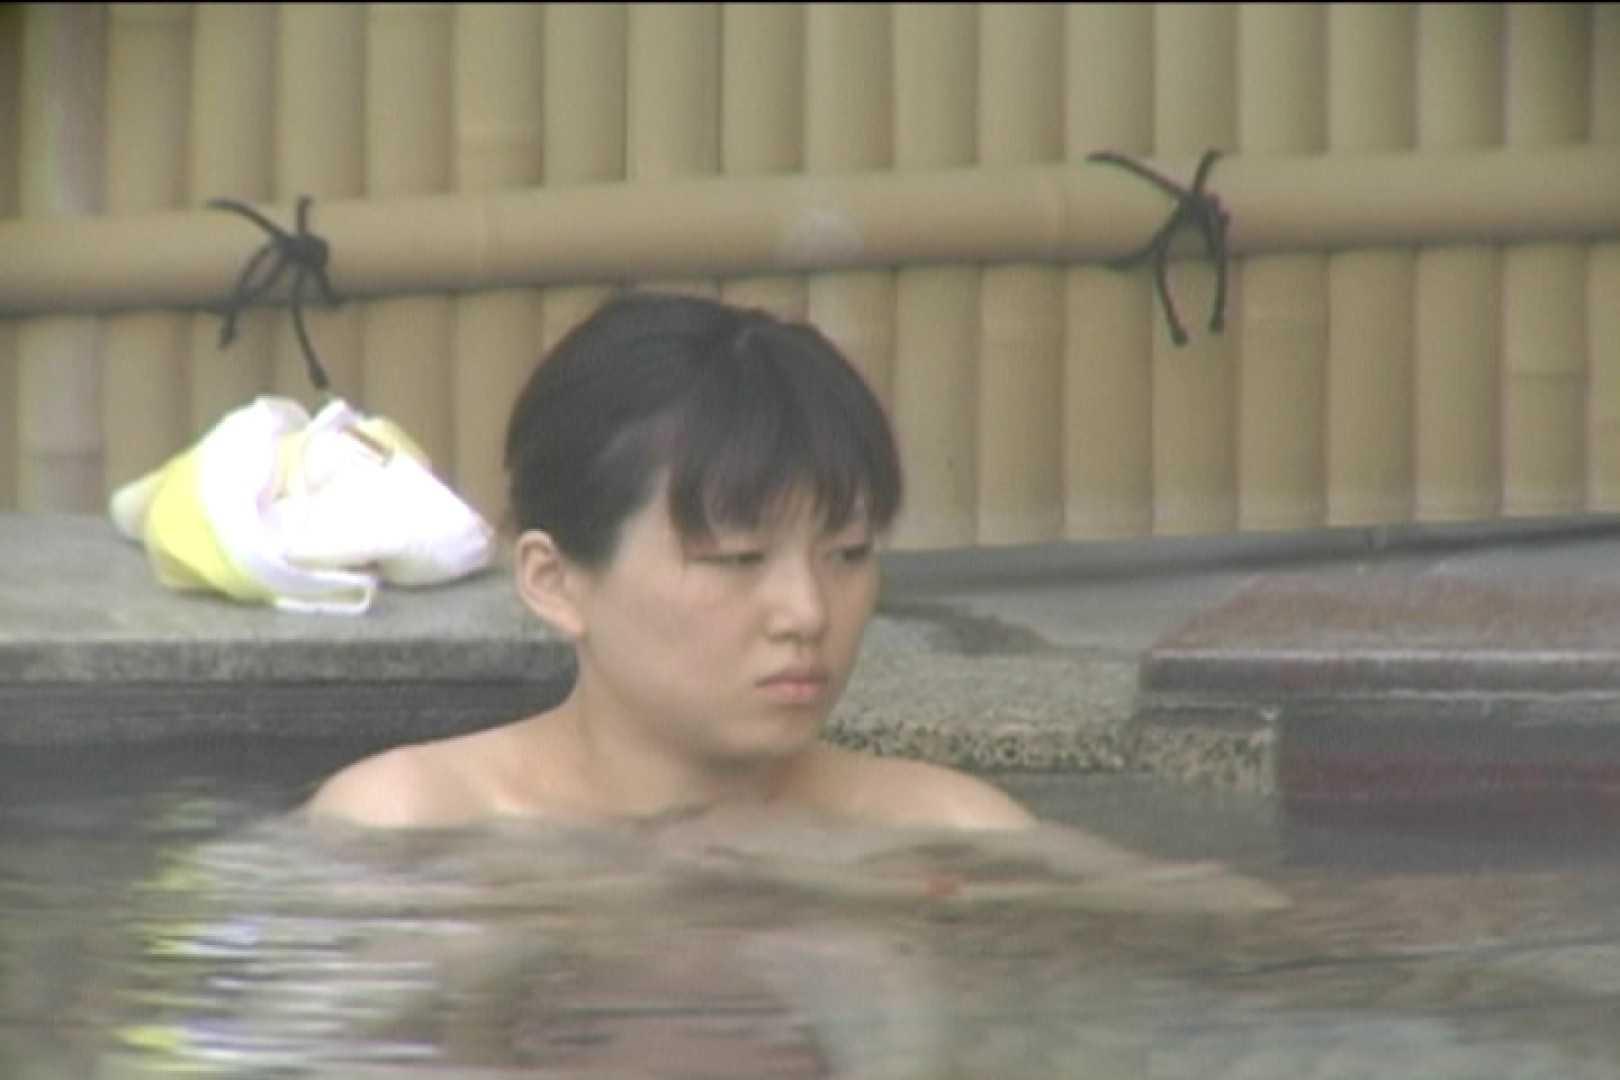 Aquaな露天風呂Vol.121 美しいOLの裸体   露天風呂突入  105pic 16